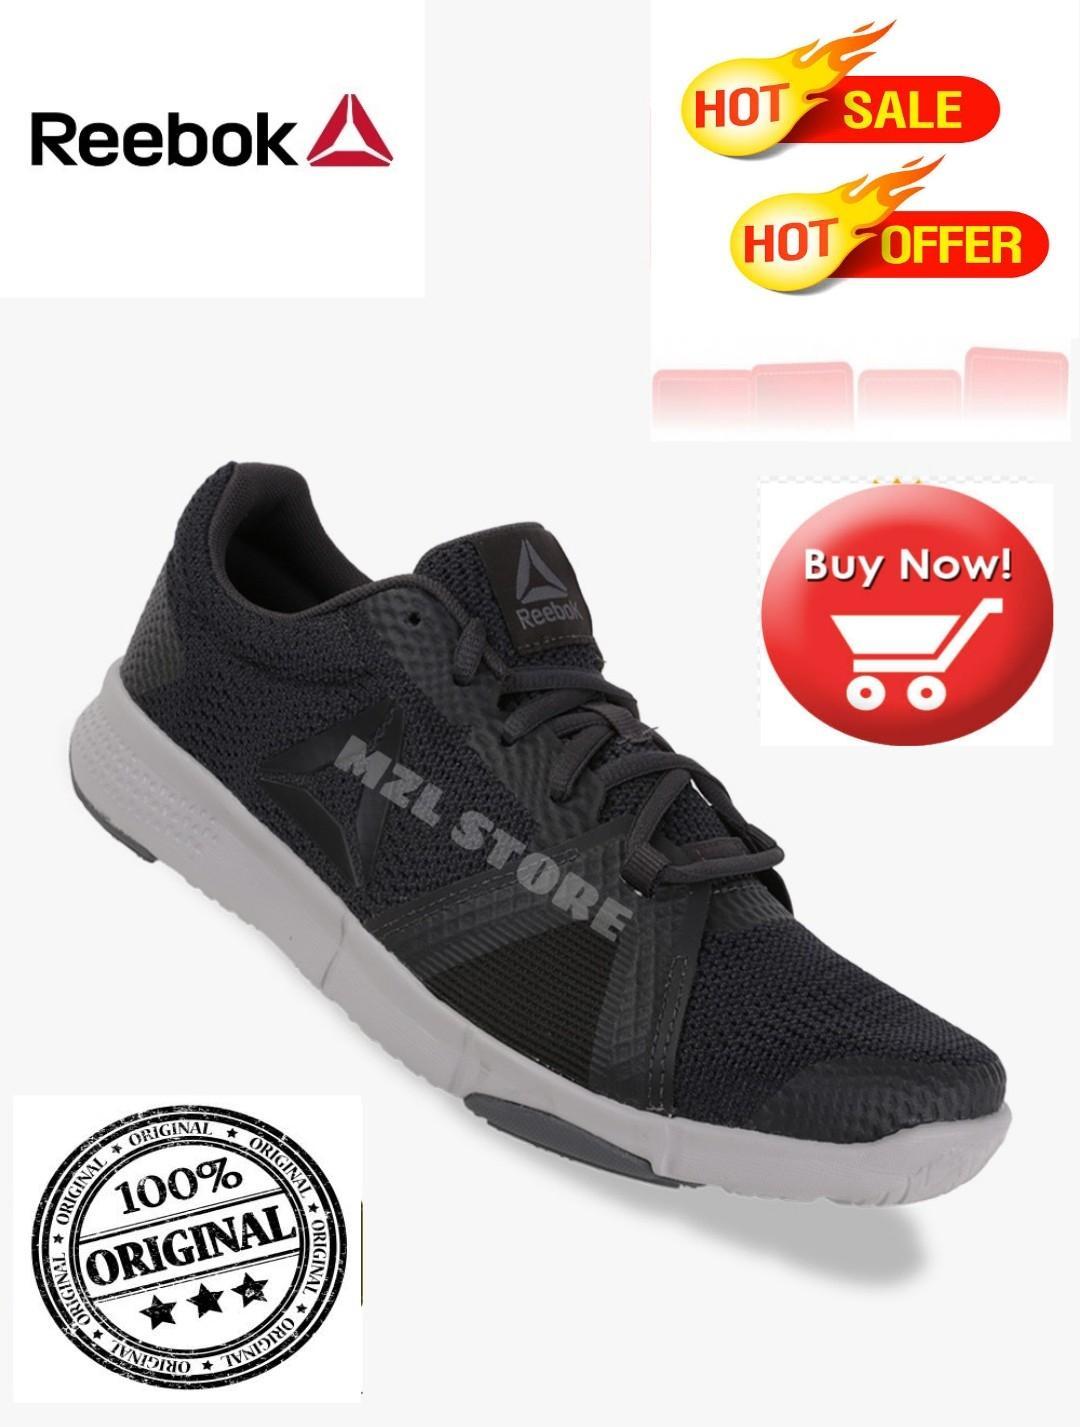 Sepatu Tranning Wanita Reebok Flexile - abu abu 8570e01f9c